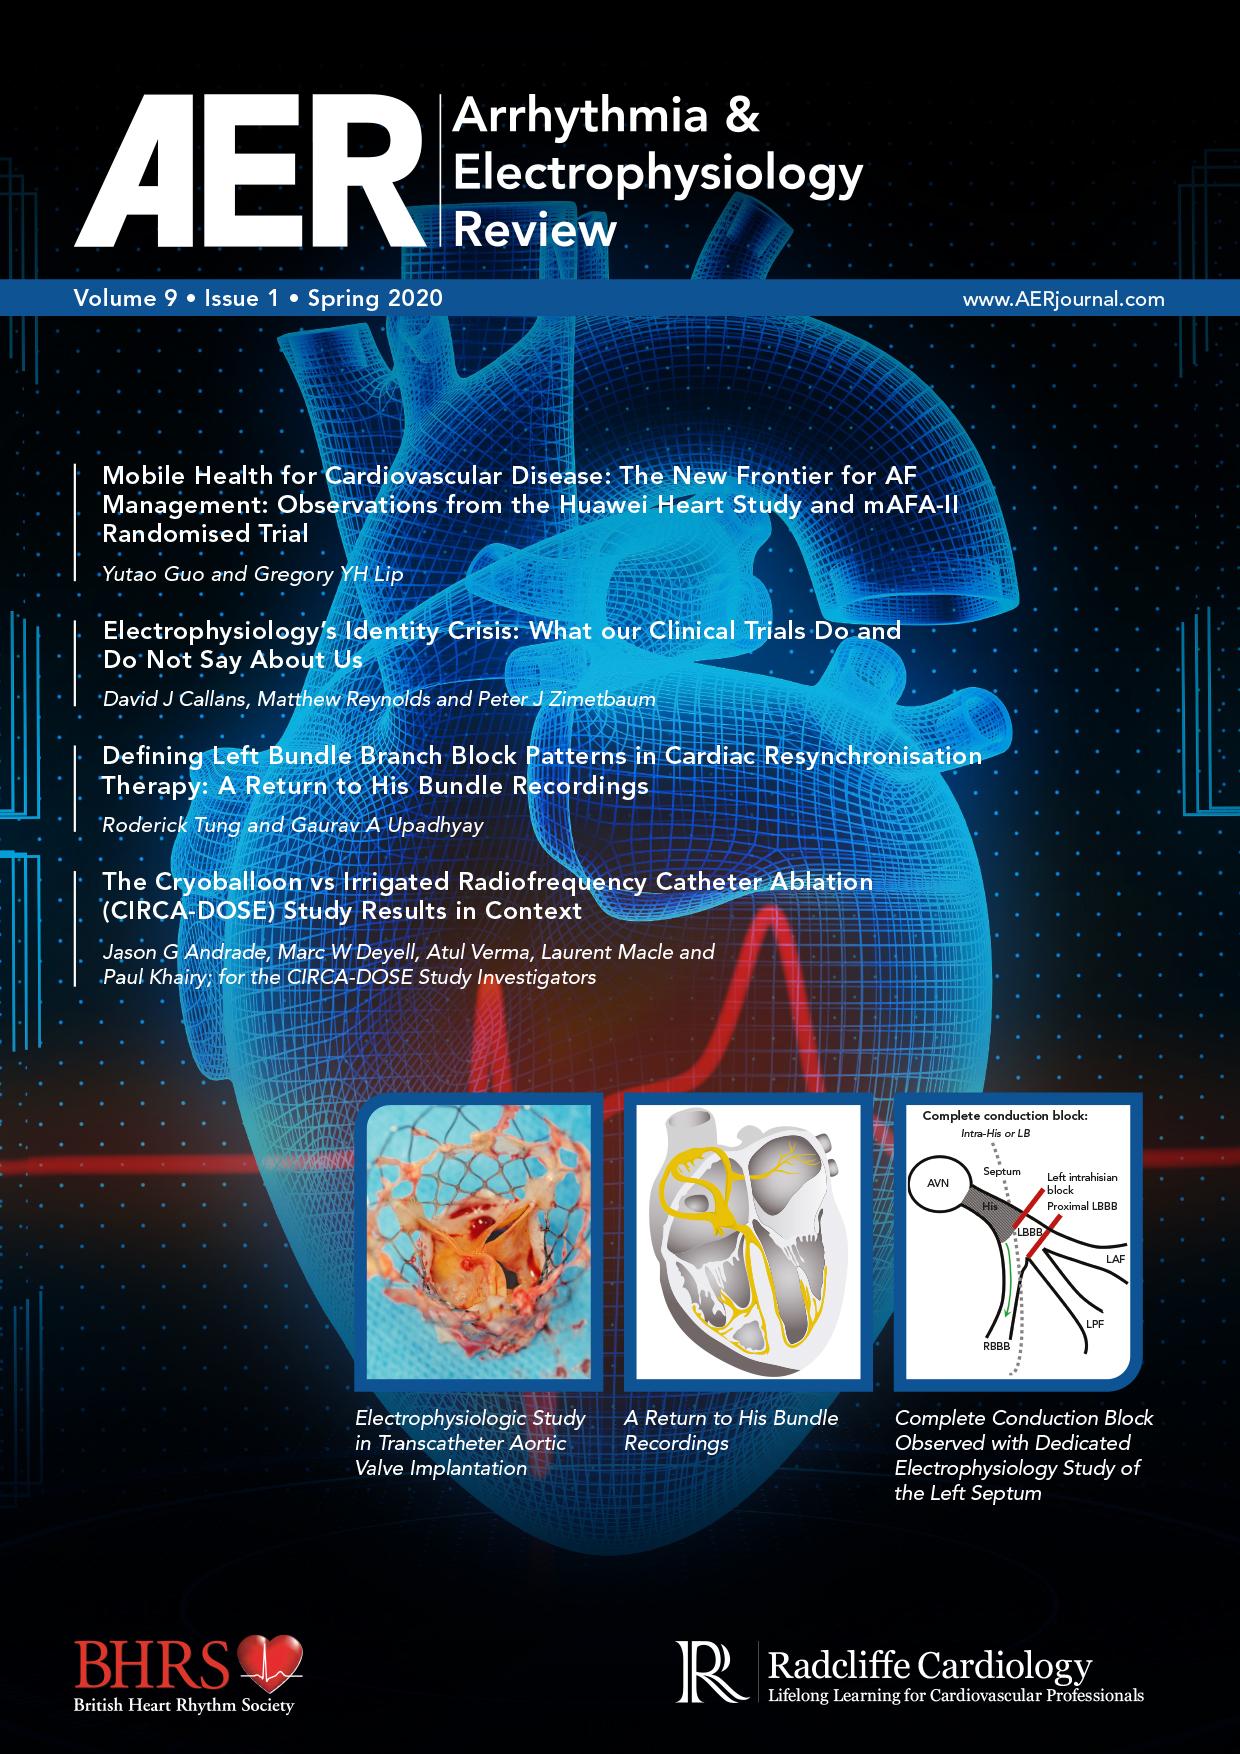 AER Volume 9 Issue 1 Spring 2020